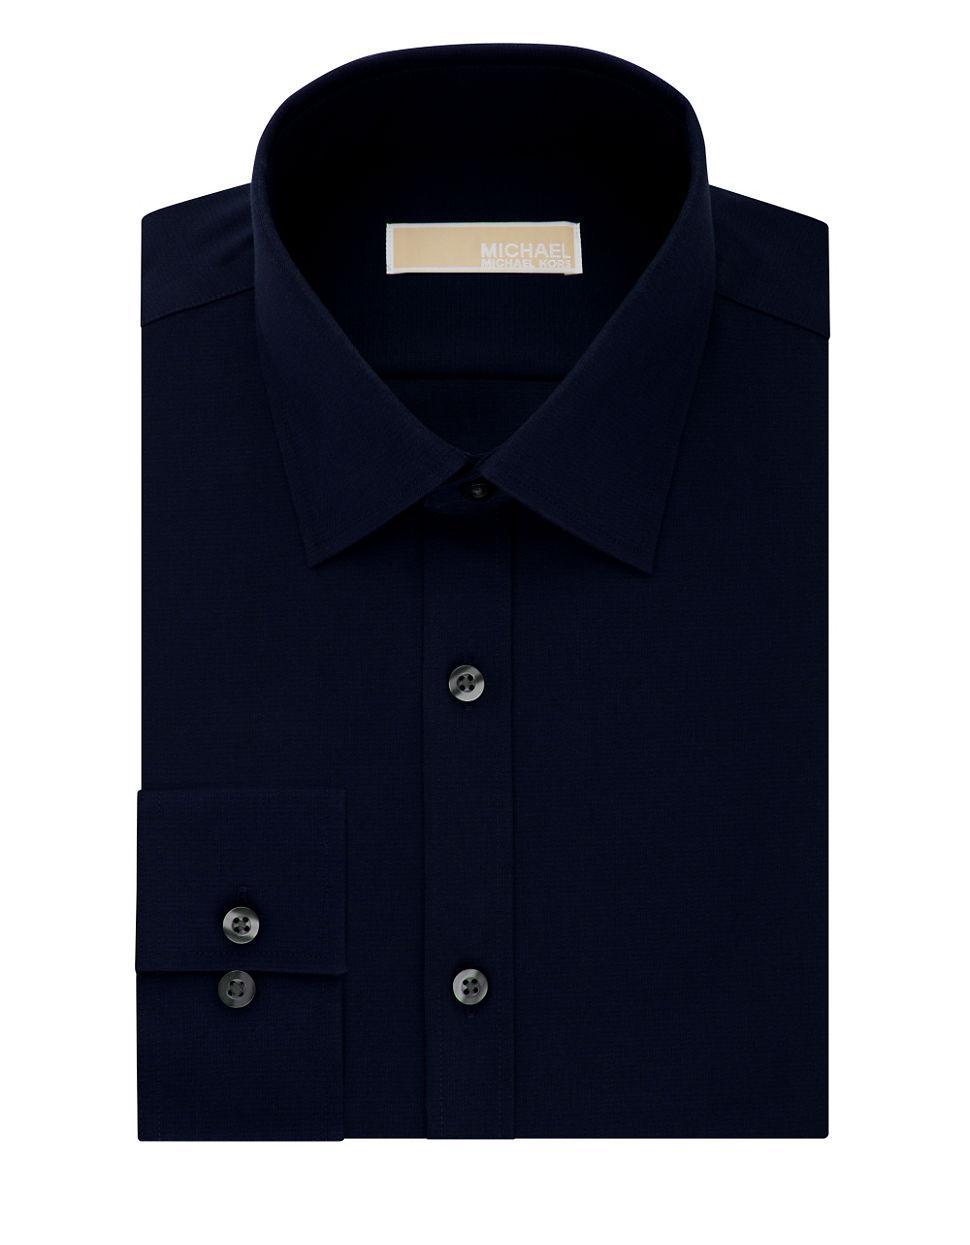 Michael Michael Kors Cotton Dress Shirt In Blue For Men Lyst